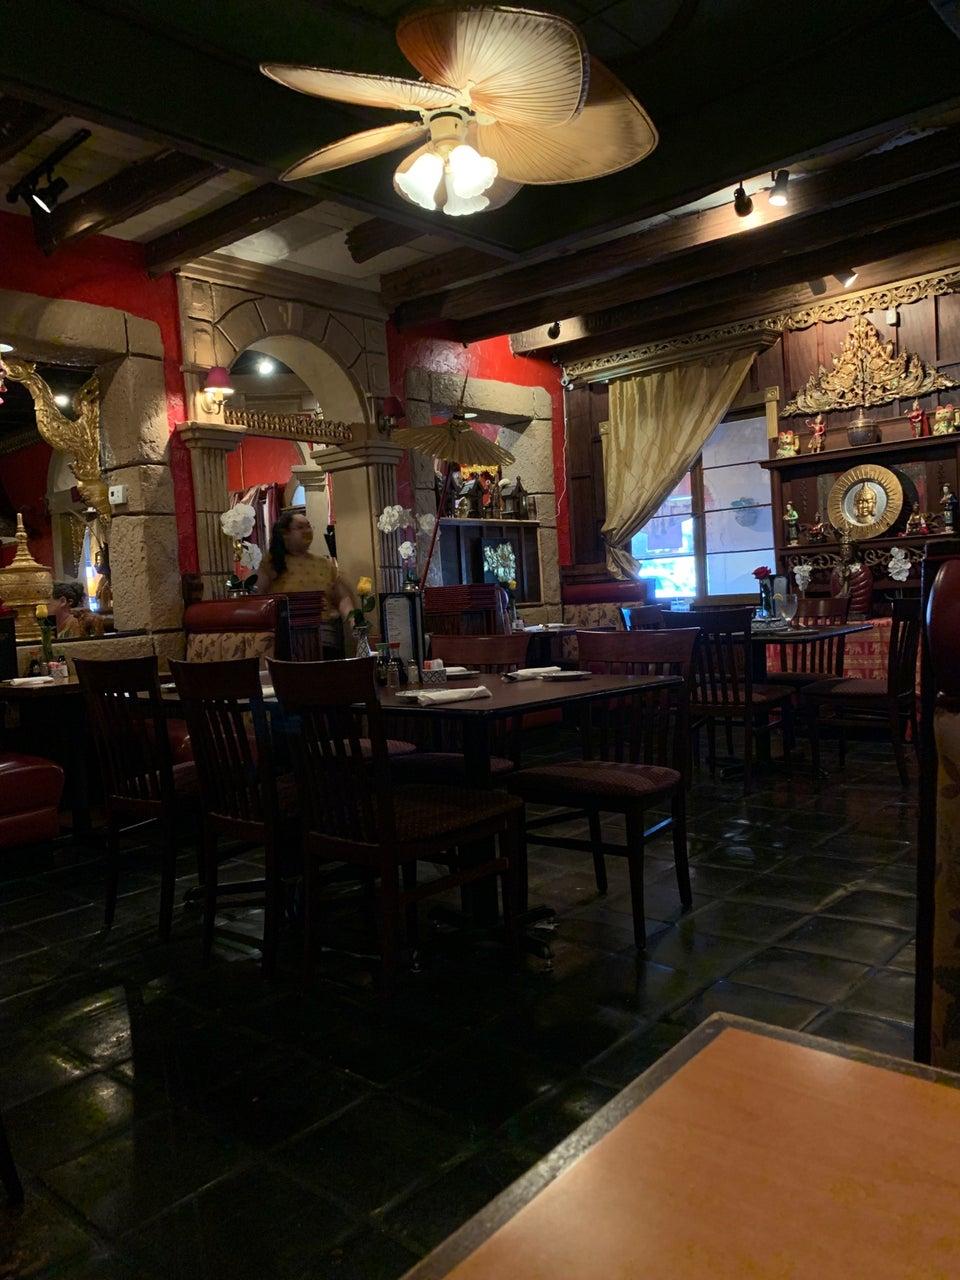 Lanna Thai and Sushi Restaurant 4871 Park St N, St. Petersburg